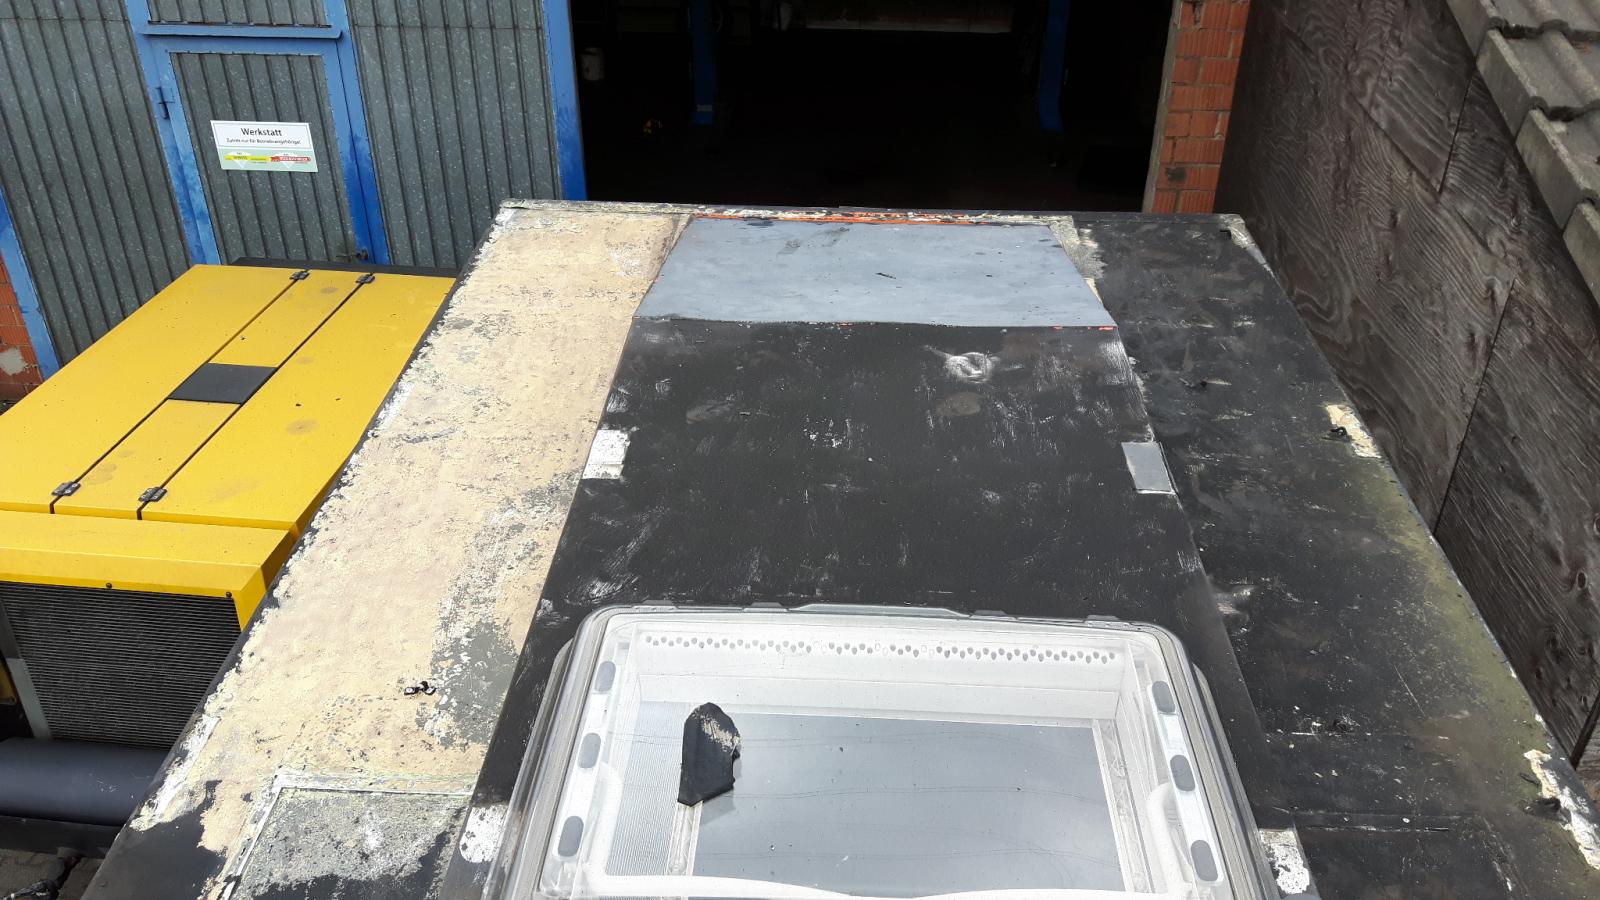 101 Forward Control - Bitumen-verseuchtes Dach. Macht doch nicht sowas!